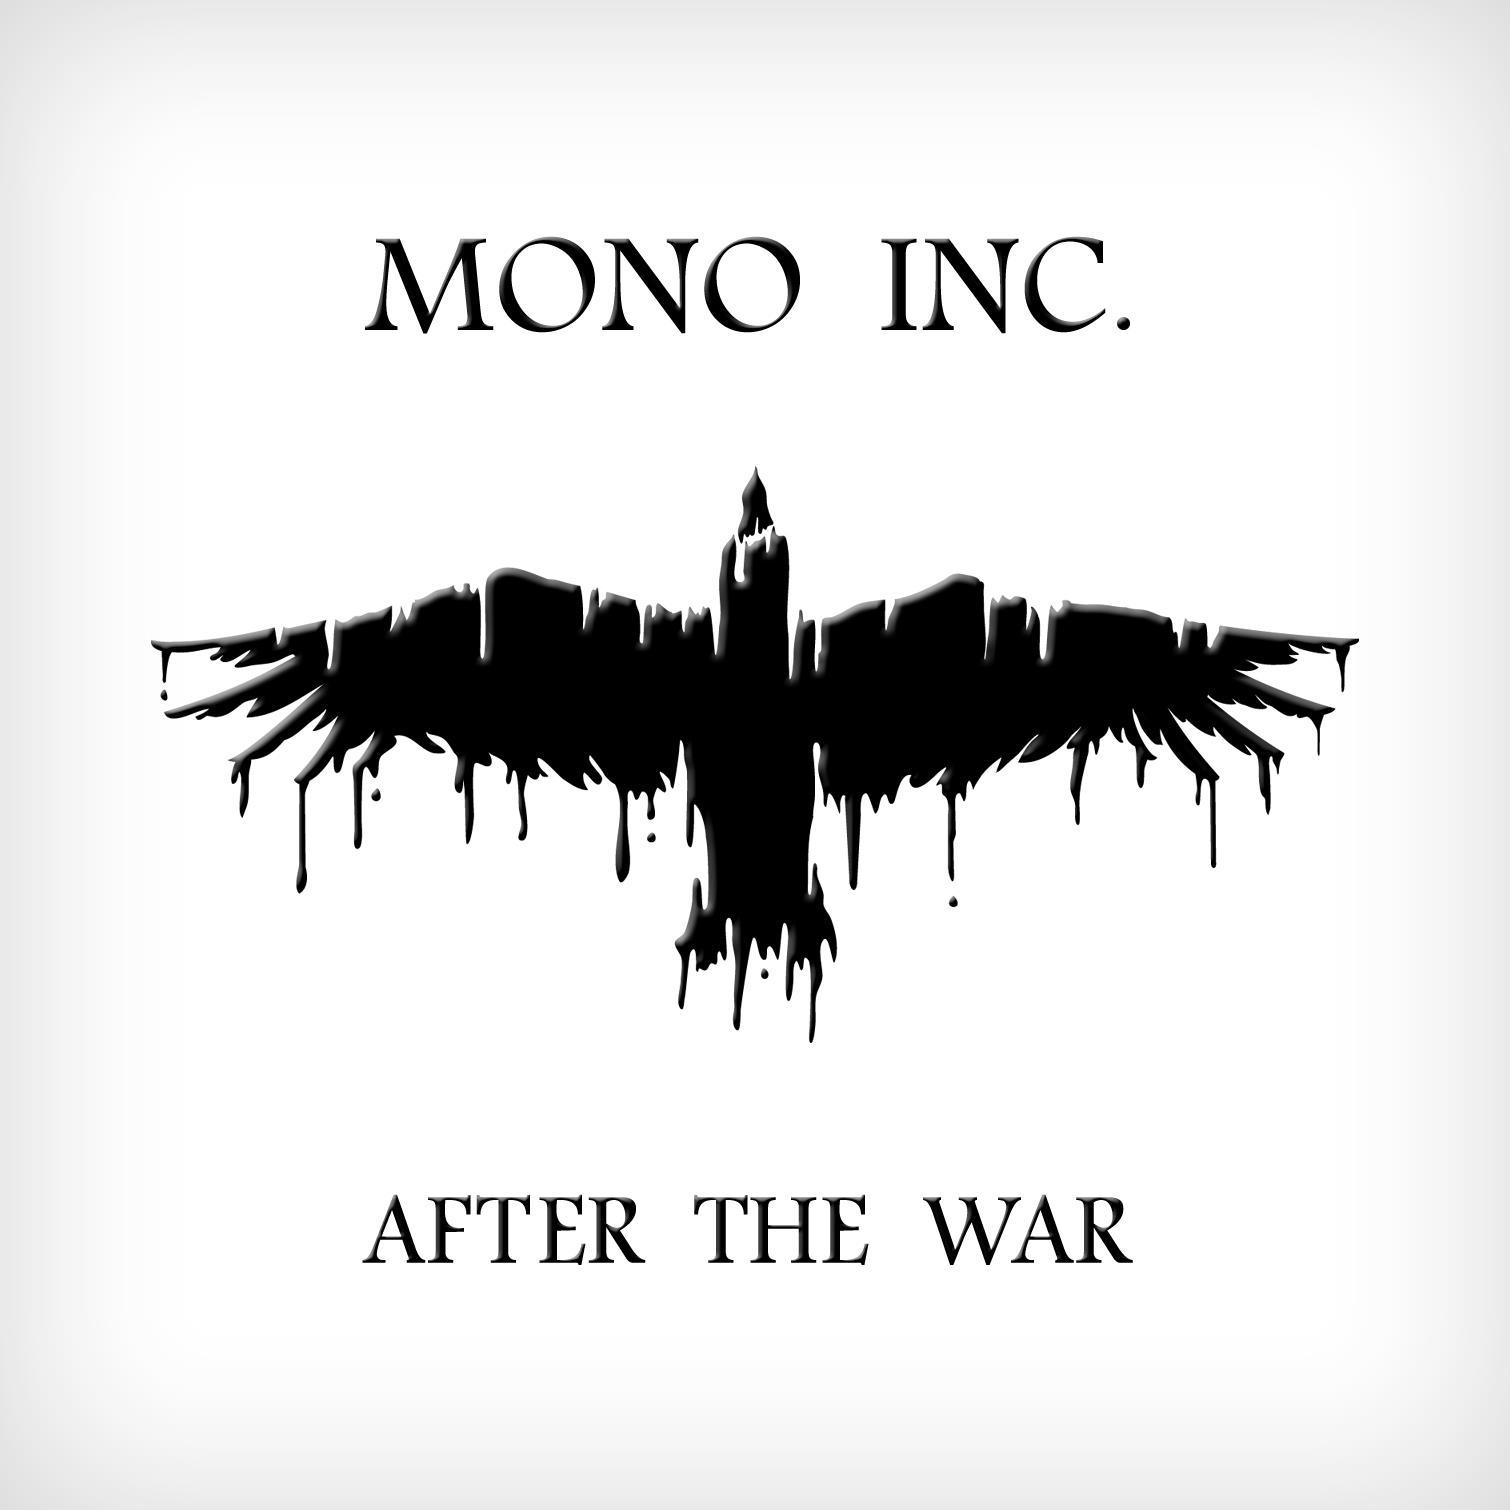 Mono Inc. - After the War Tour 2012